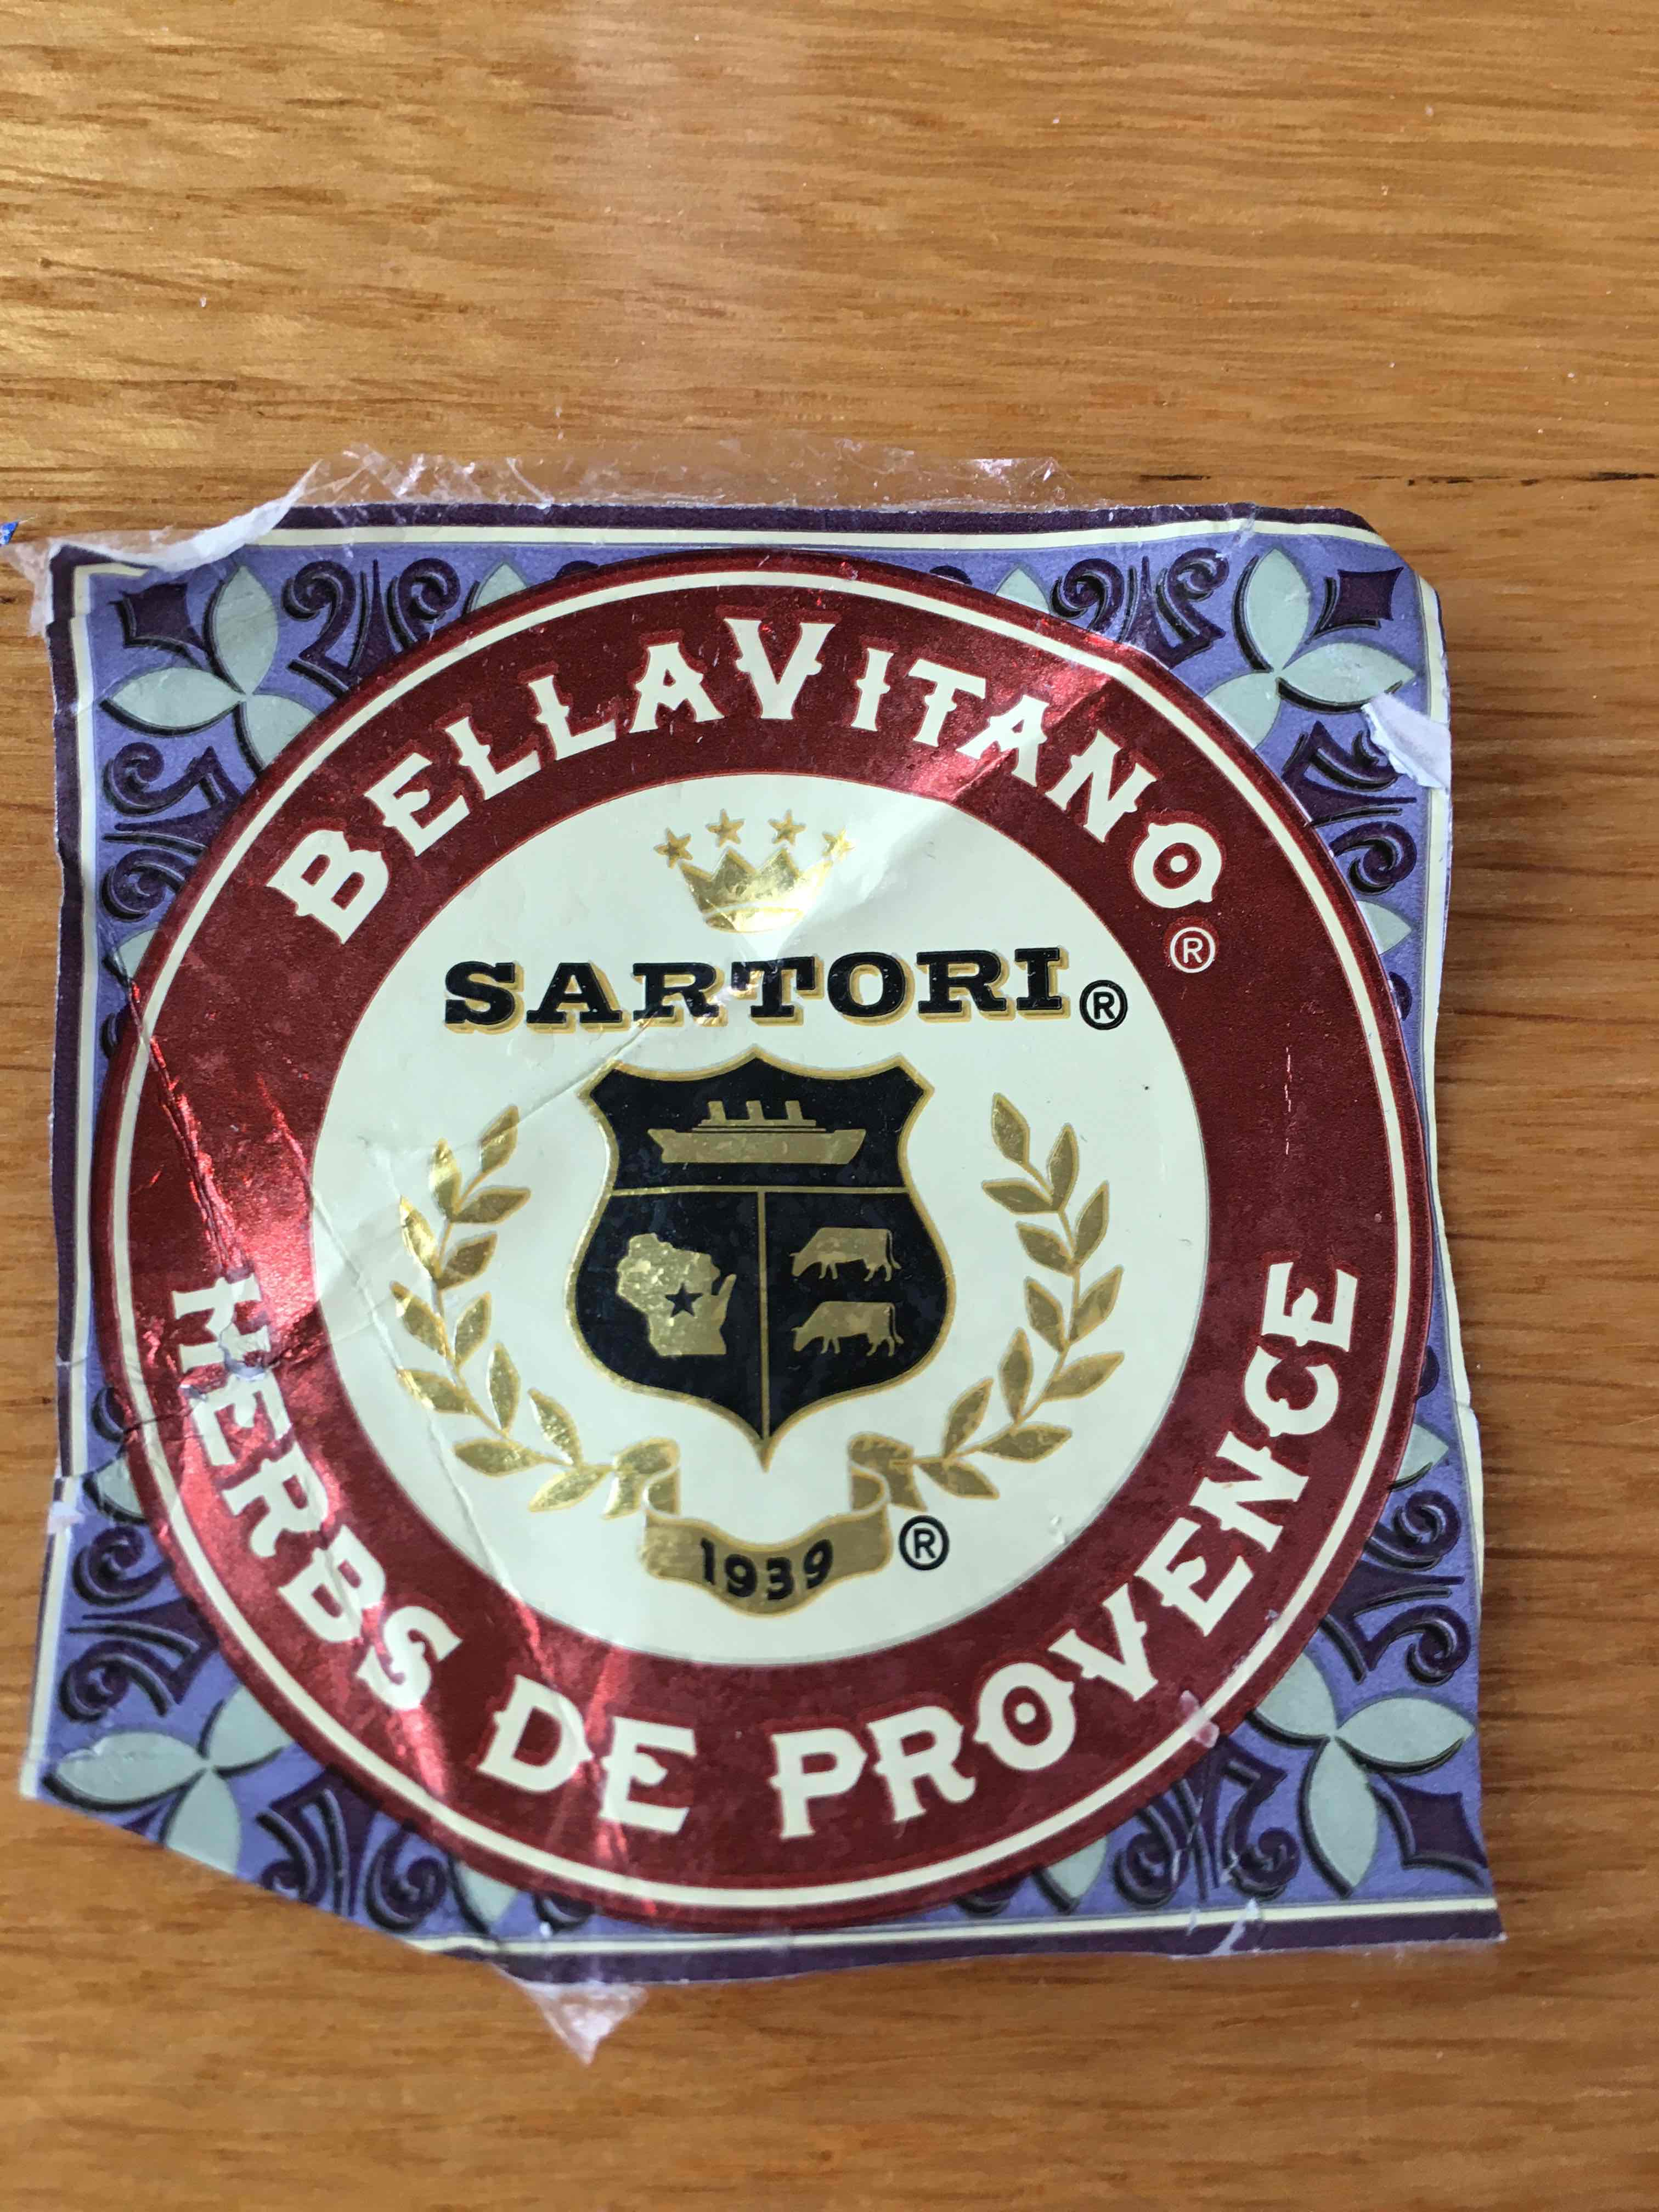 Sartori BellaVitano Herbs de Provence